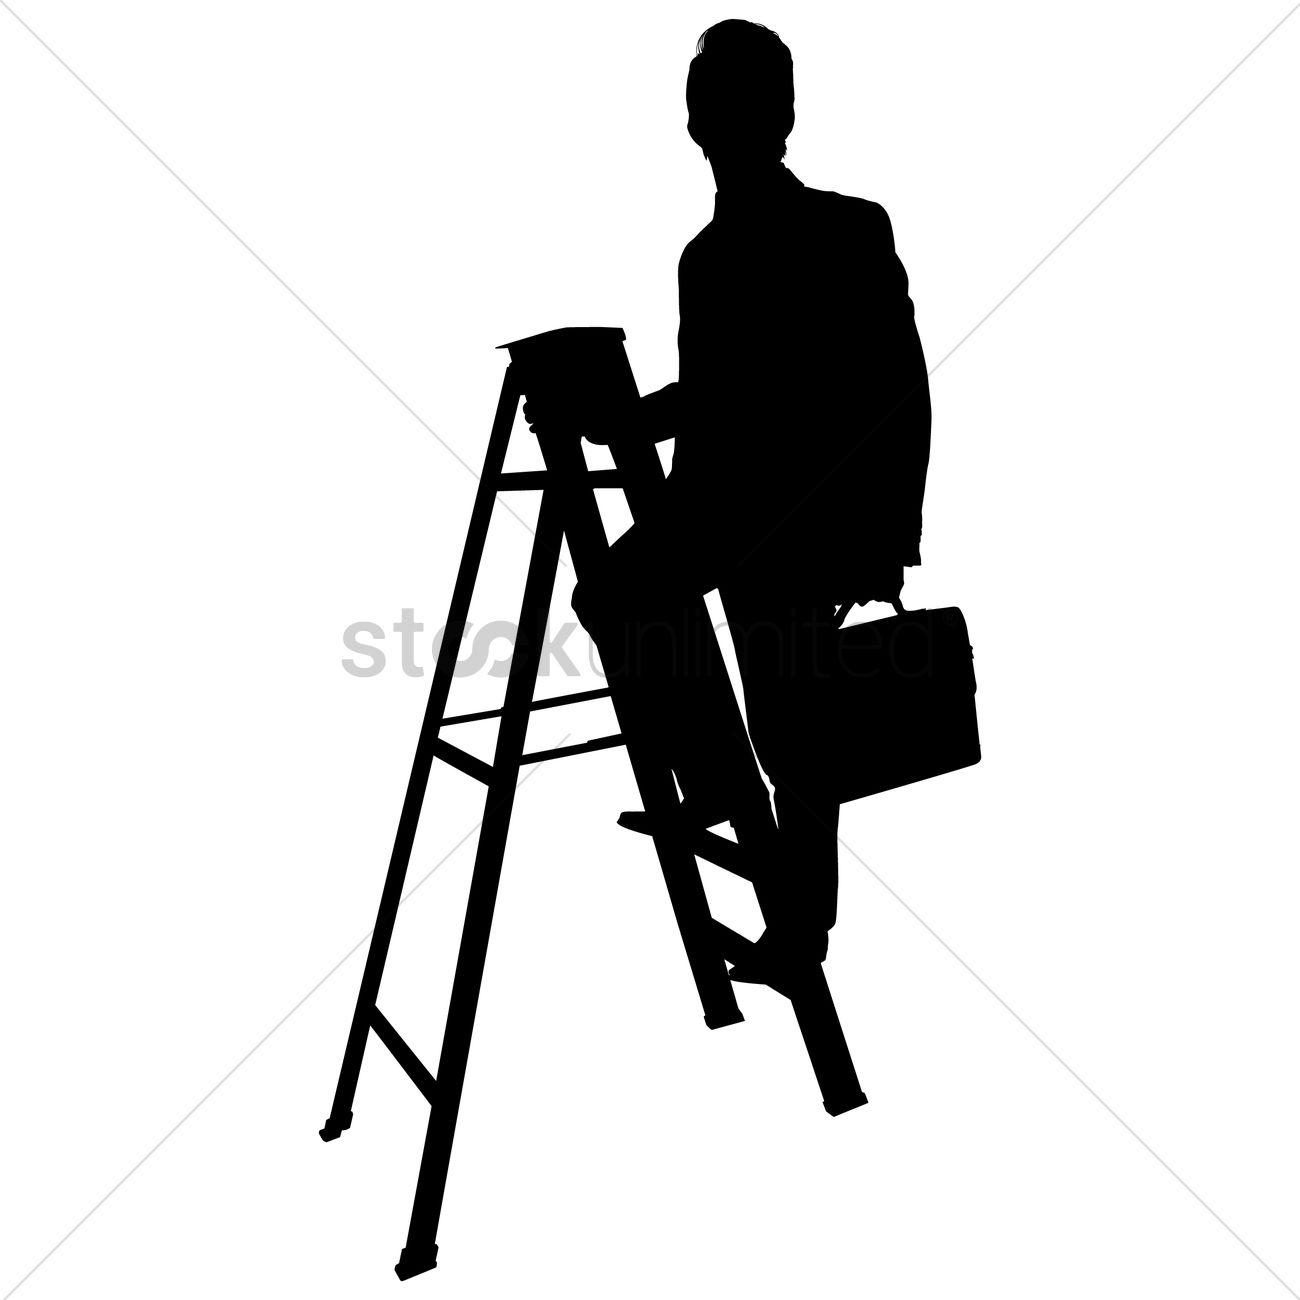 1300x1300 Businessman Climbing A Ladder Silhouette Vector Image